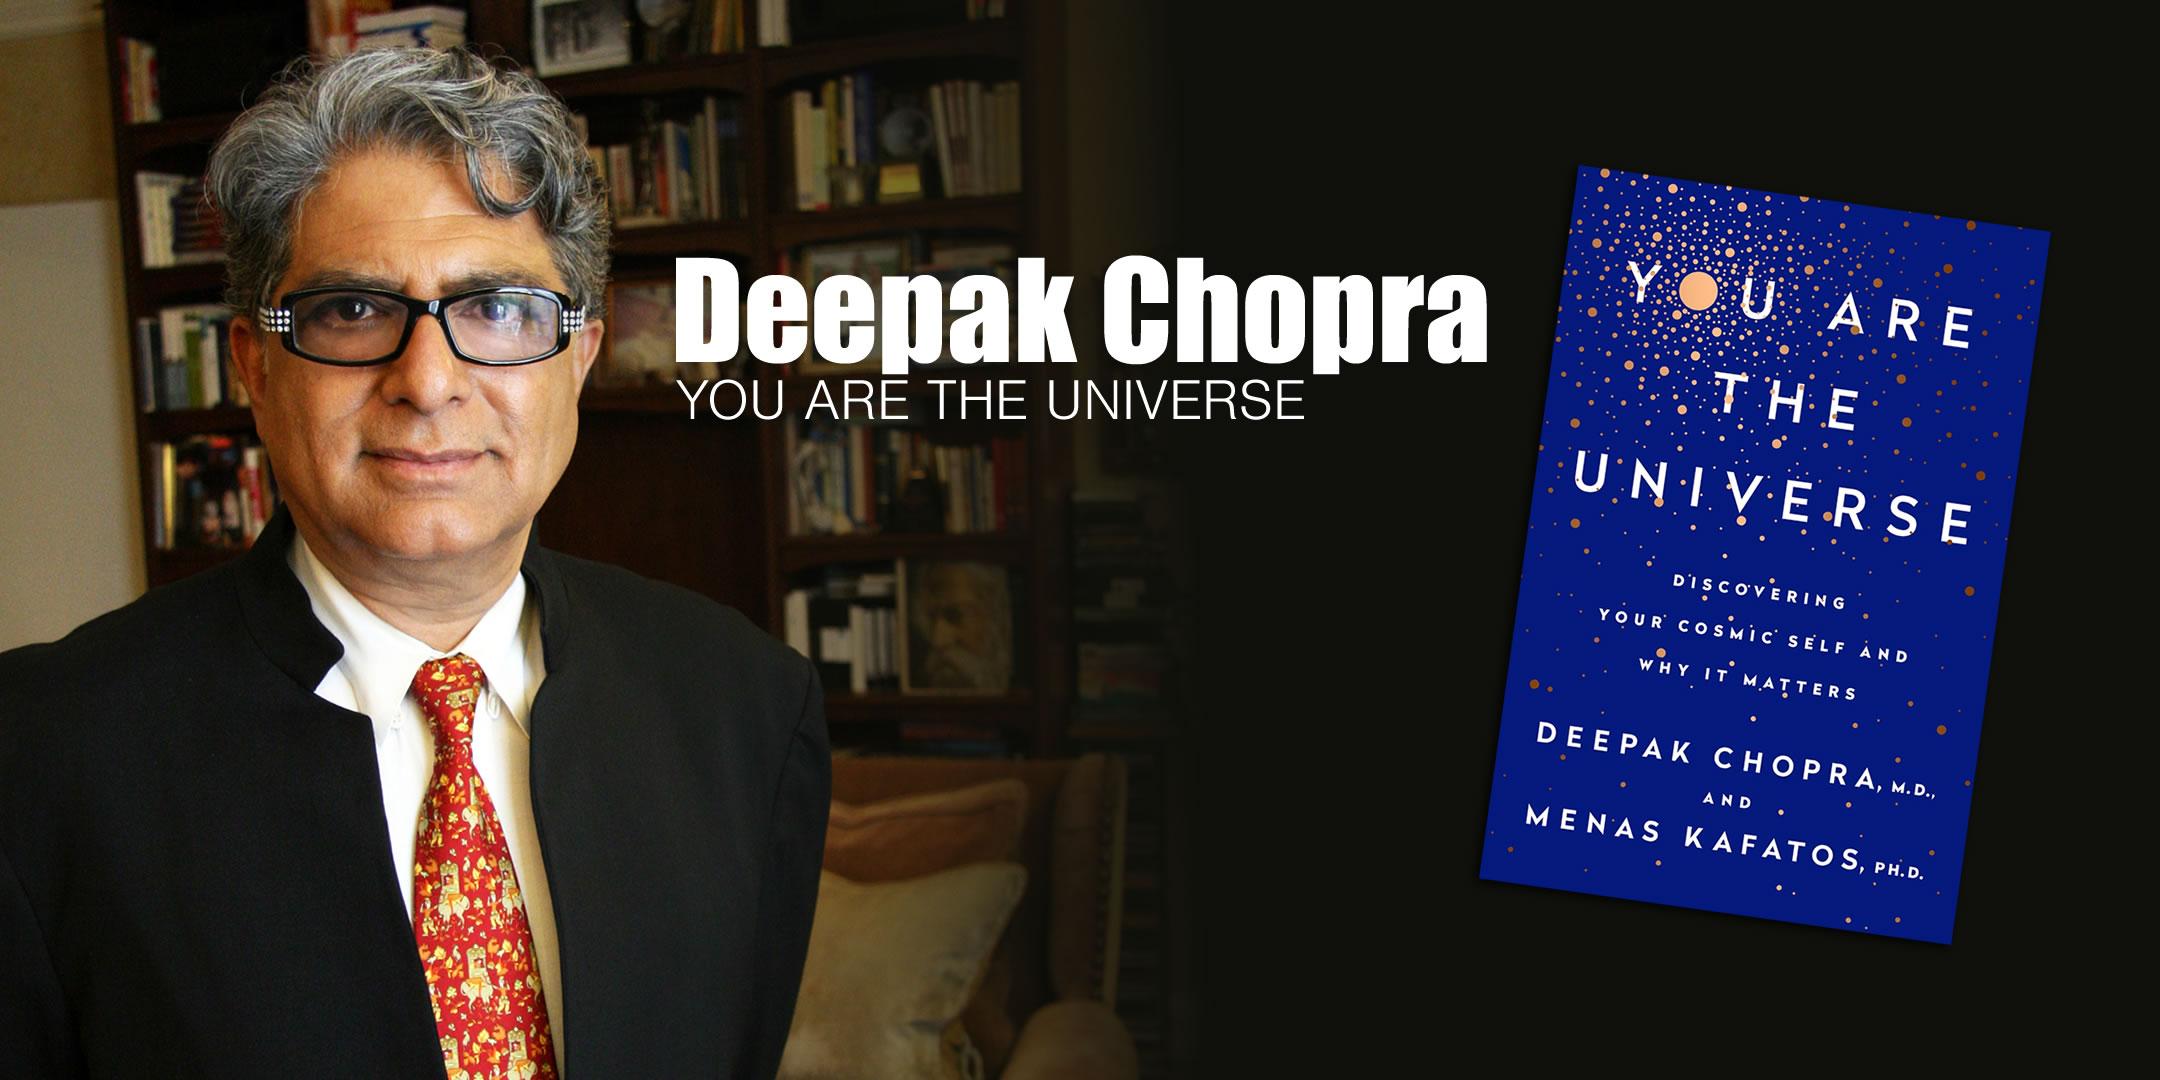 Deepak Chopra 02/19/2017 Center For Spiritual Living, Newport-Mesa